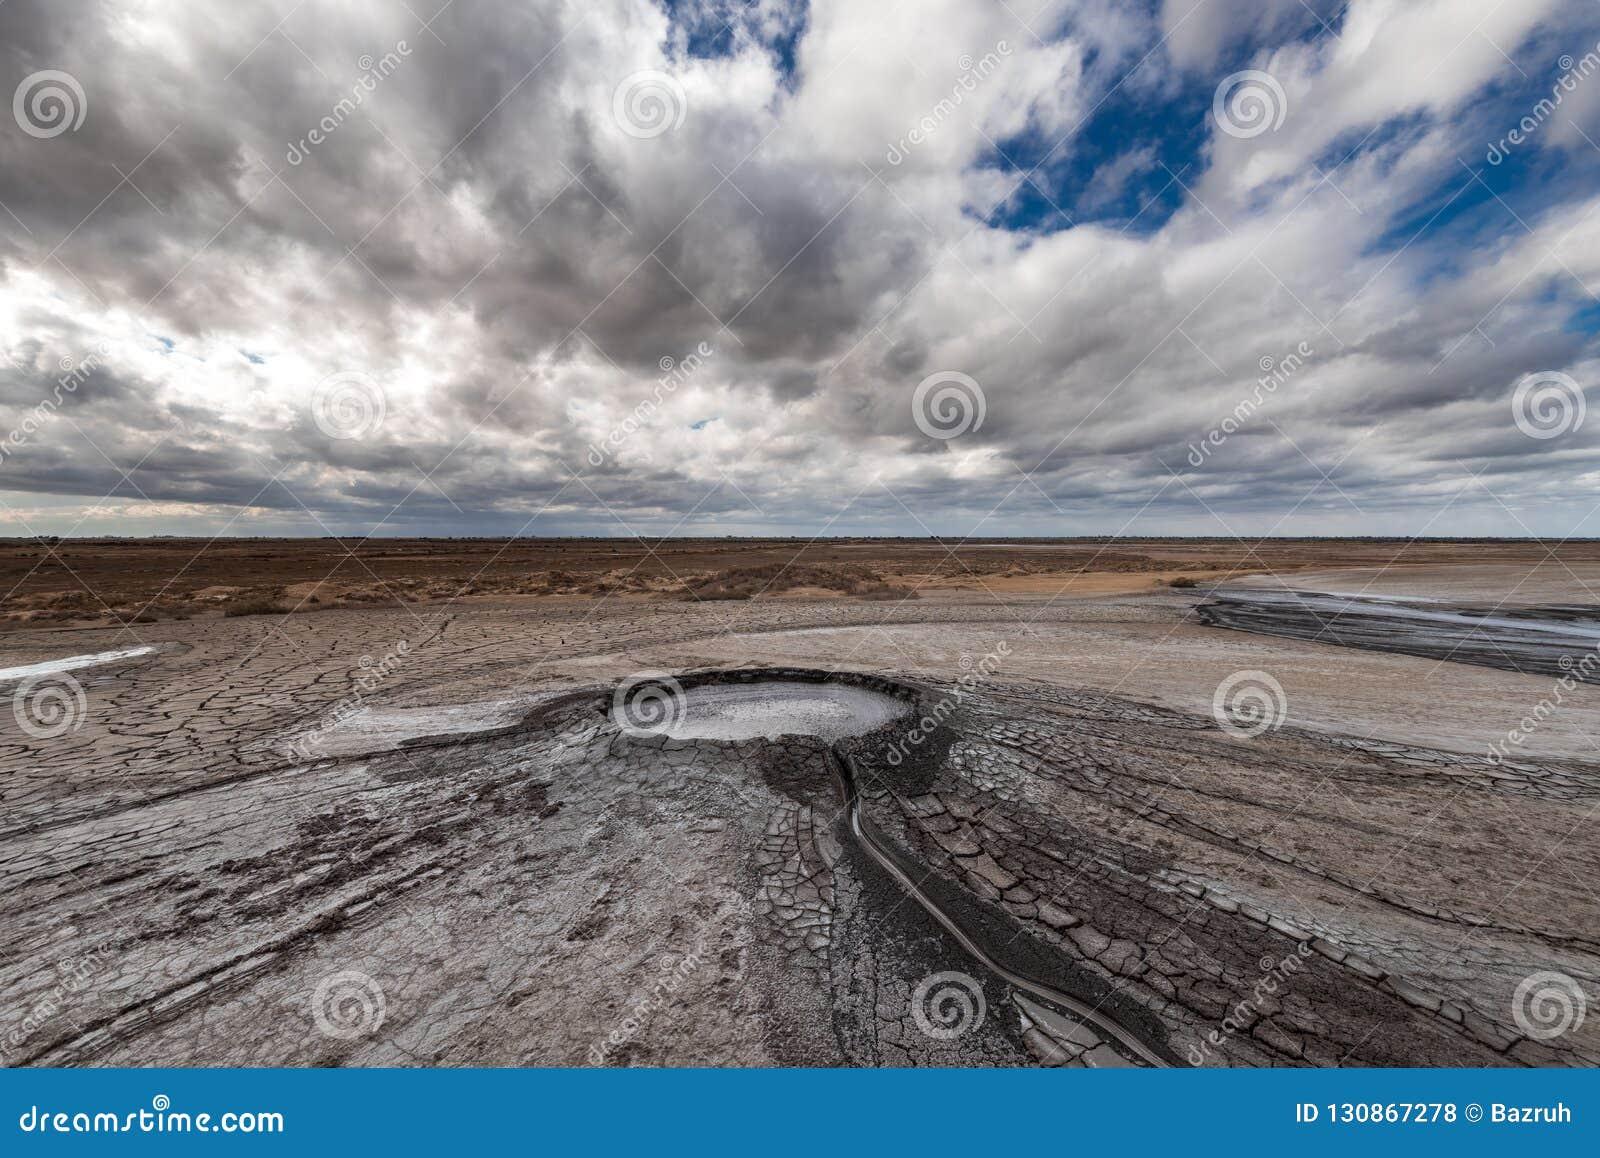 Éruption de volcan de boue, phénomène naturel